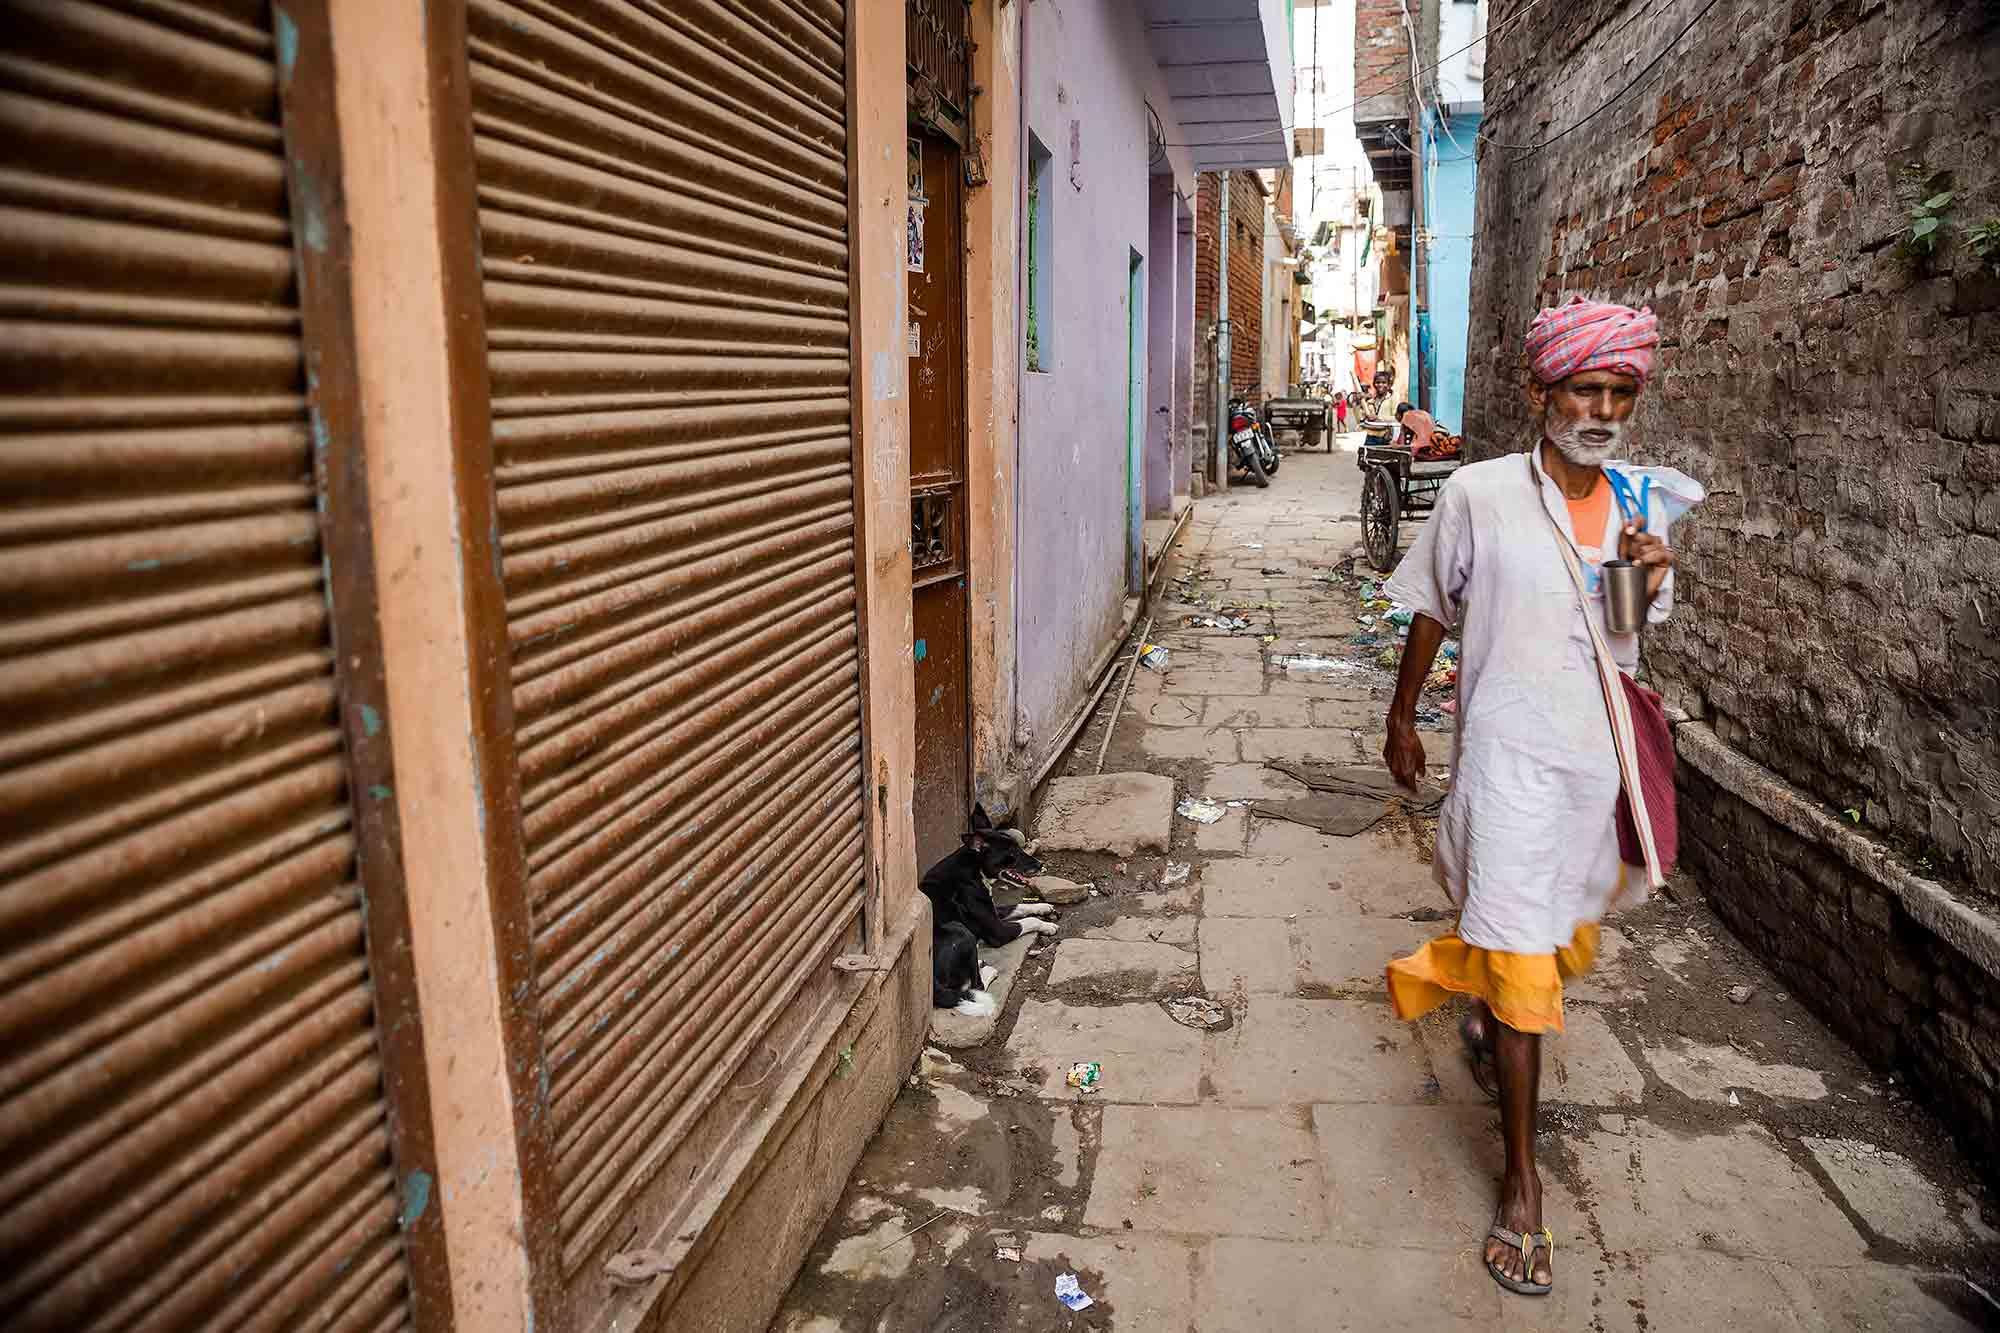 street-scene-varanasi-india